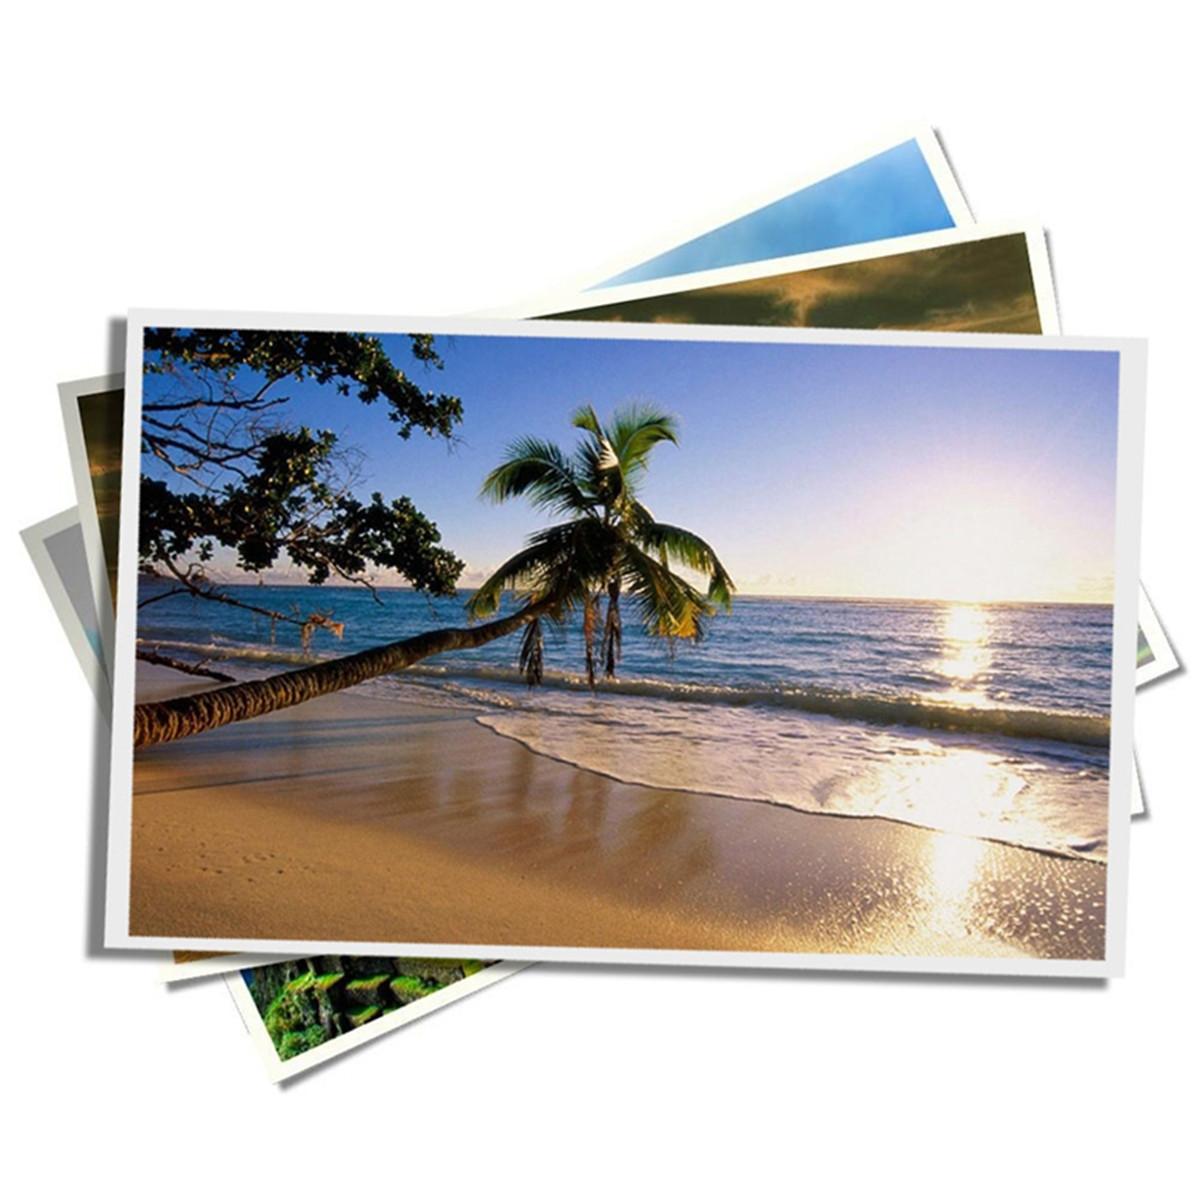 Papel Fotográfico Neutro 230G A4 - C/ 50 Folhas